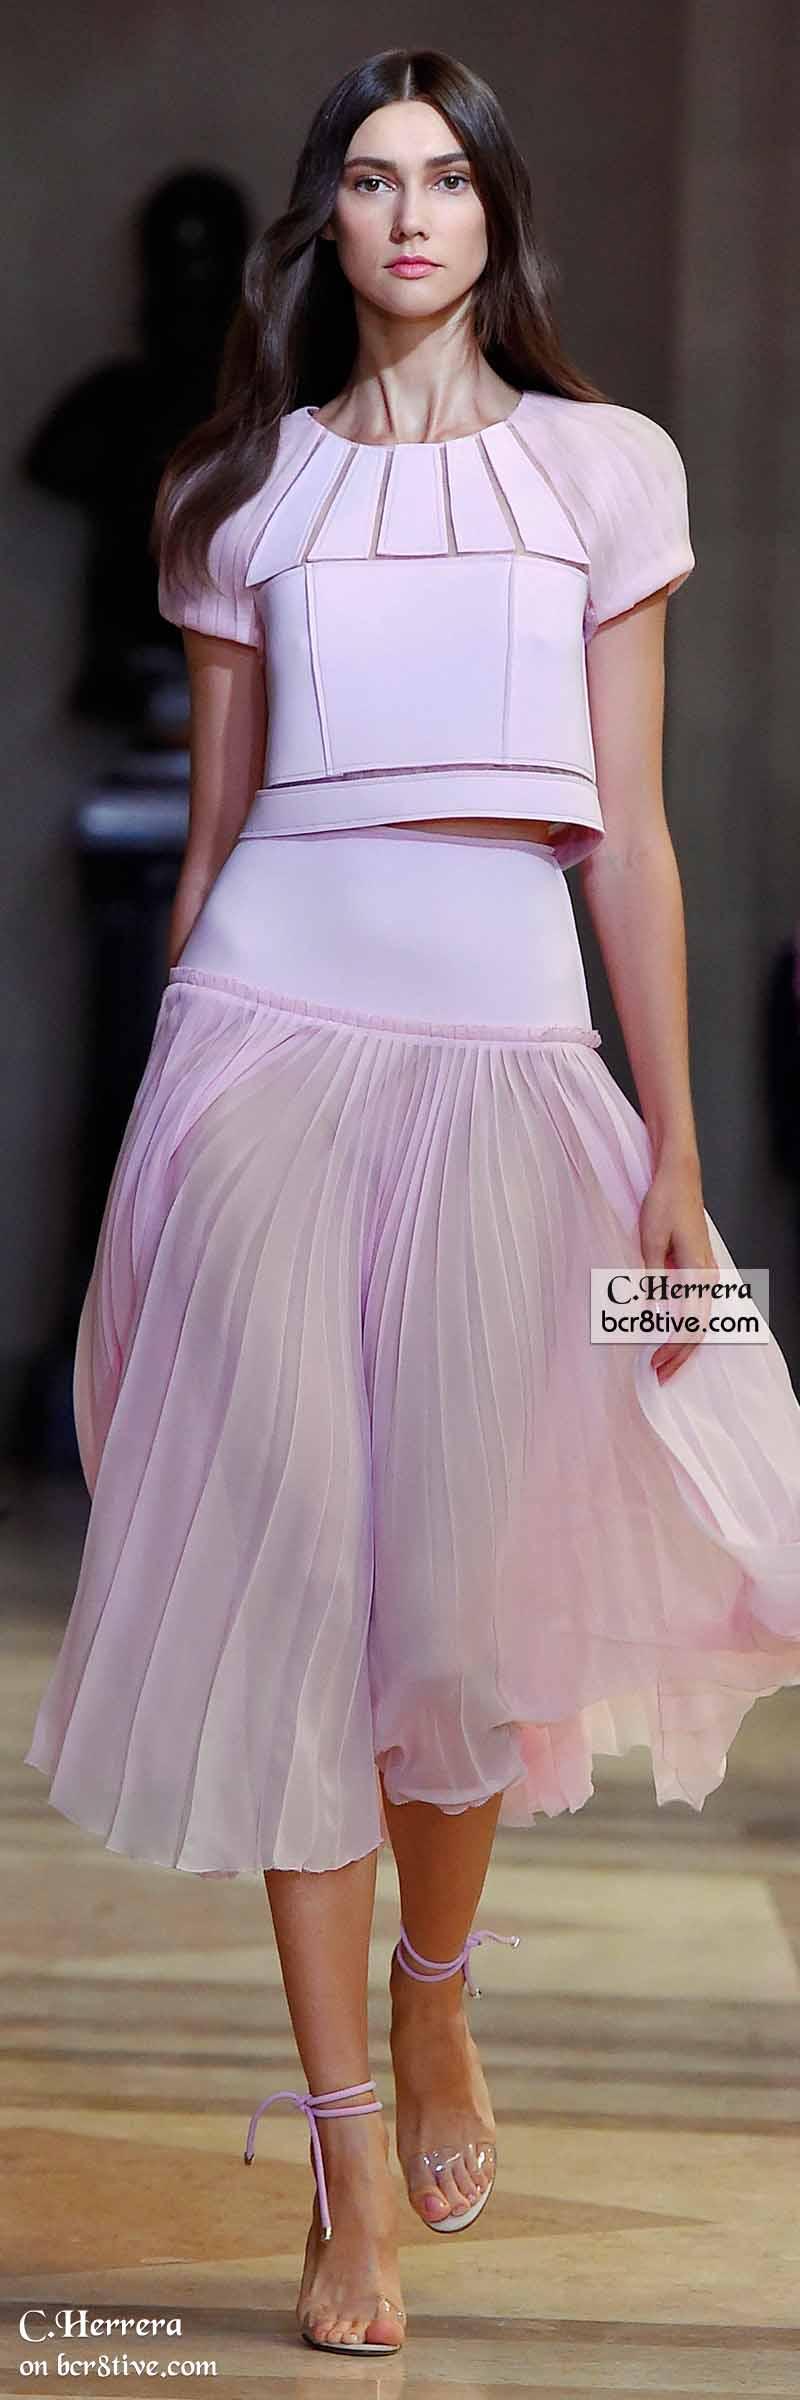 Carolina Herrera Spring 2016